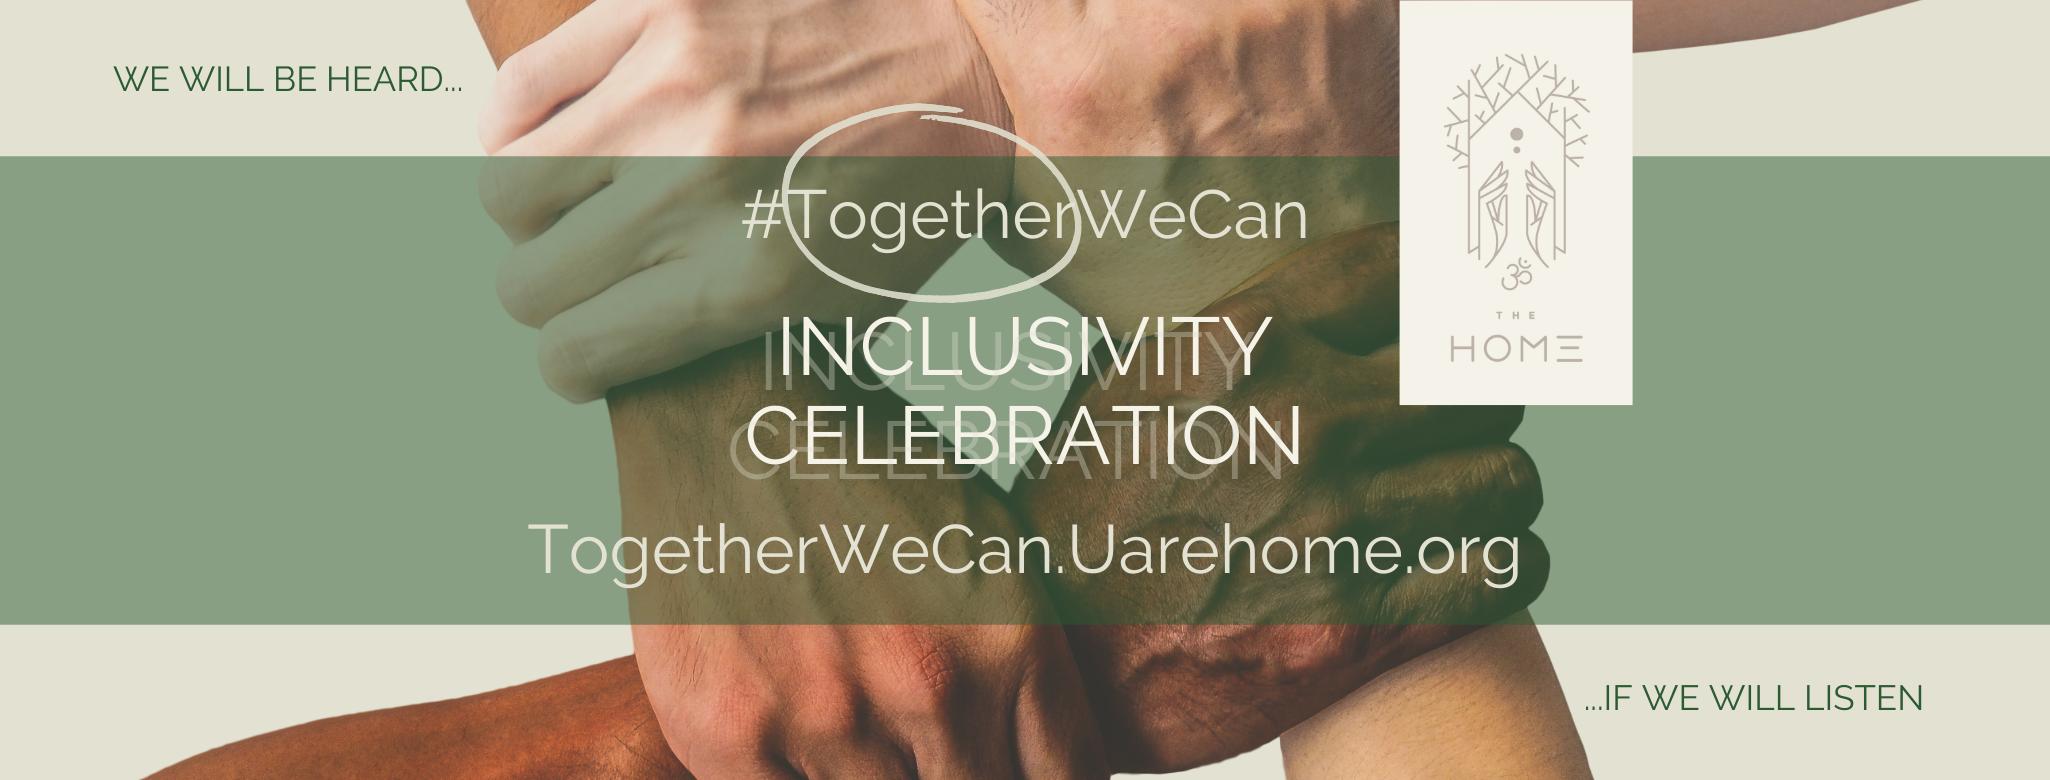 THE Home inclusivity celebration